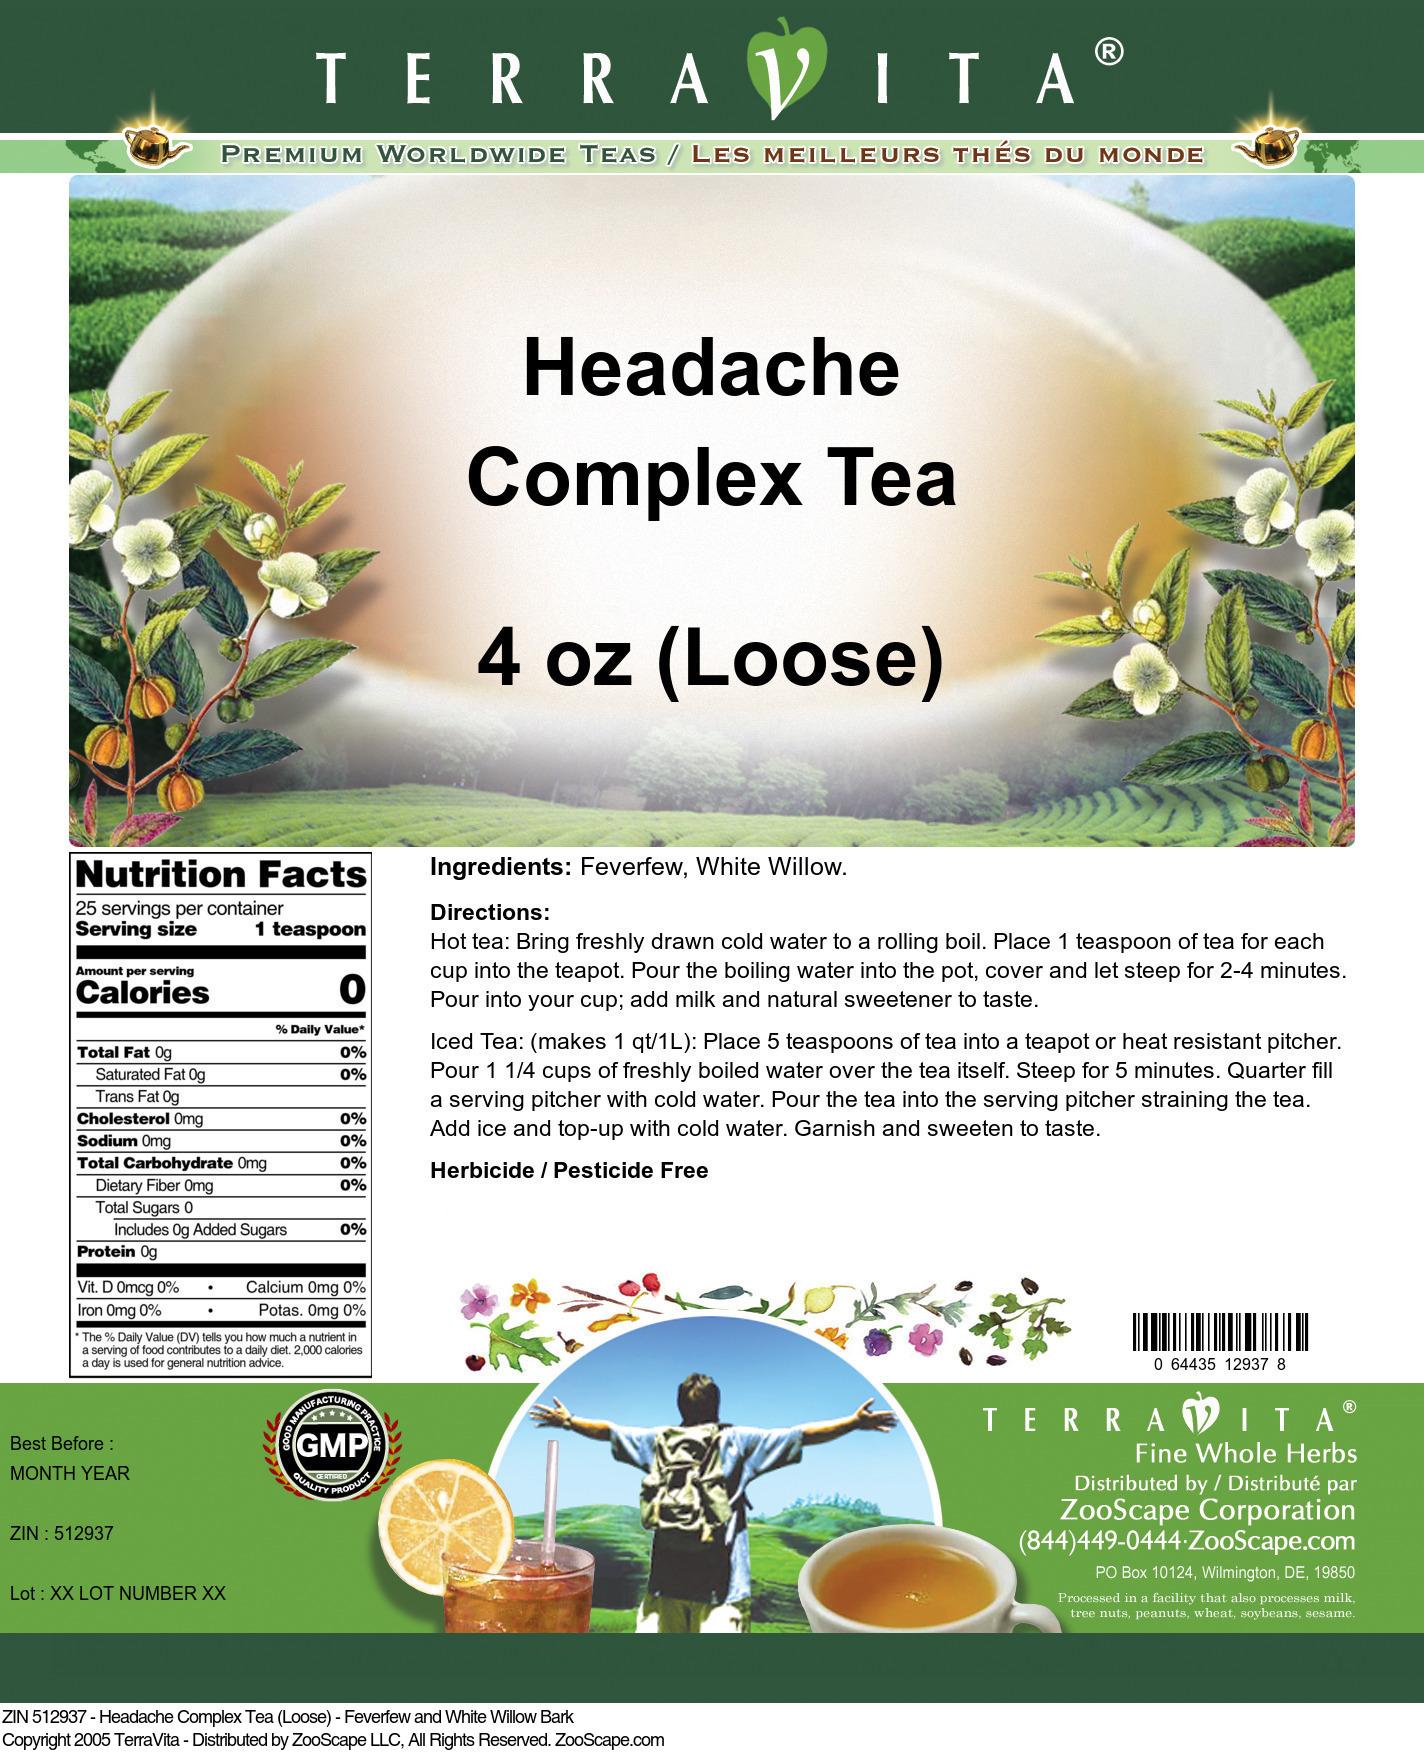 Headache Complex